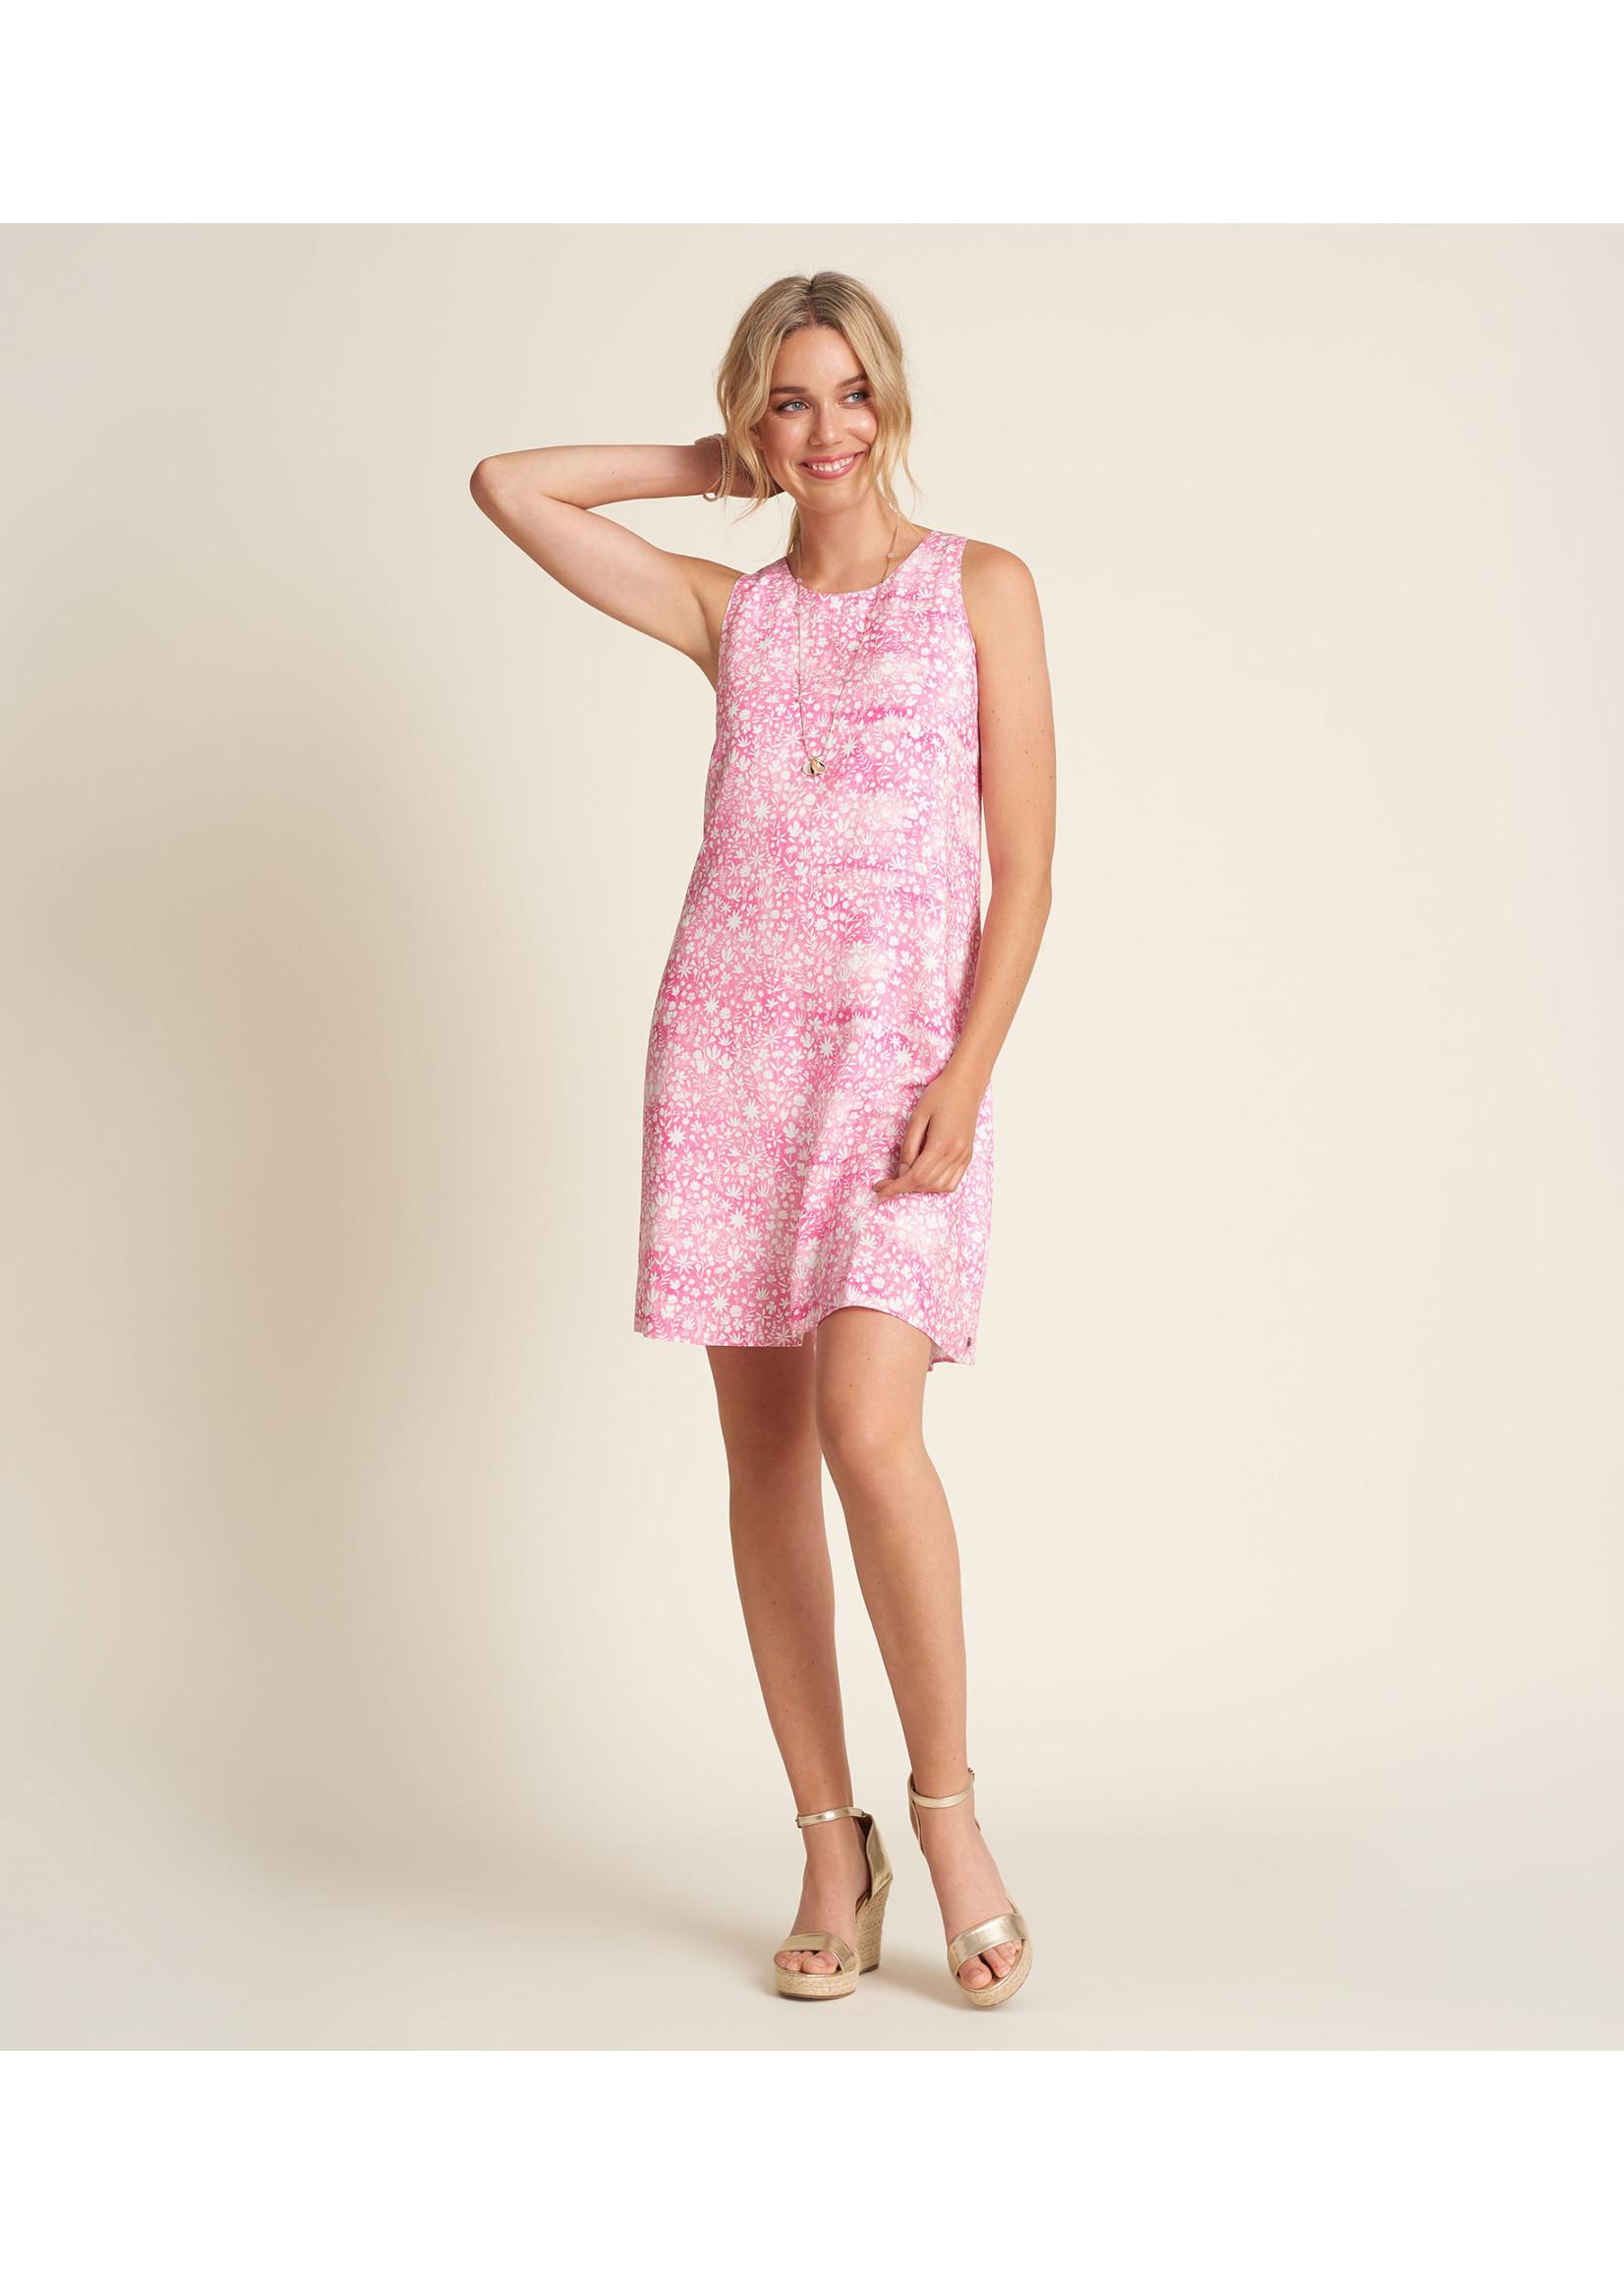 Hatley Meghan Dress Pink